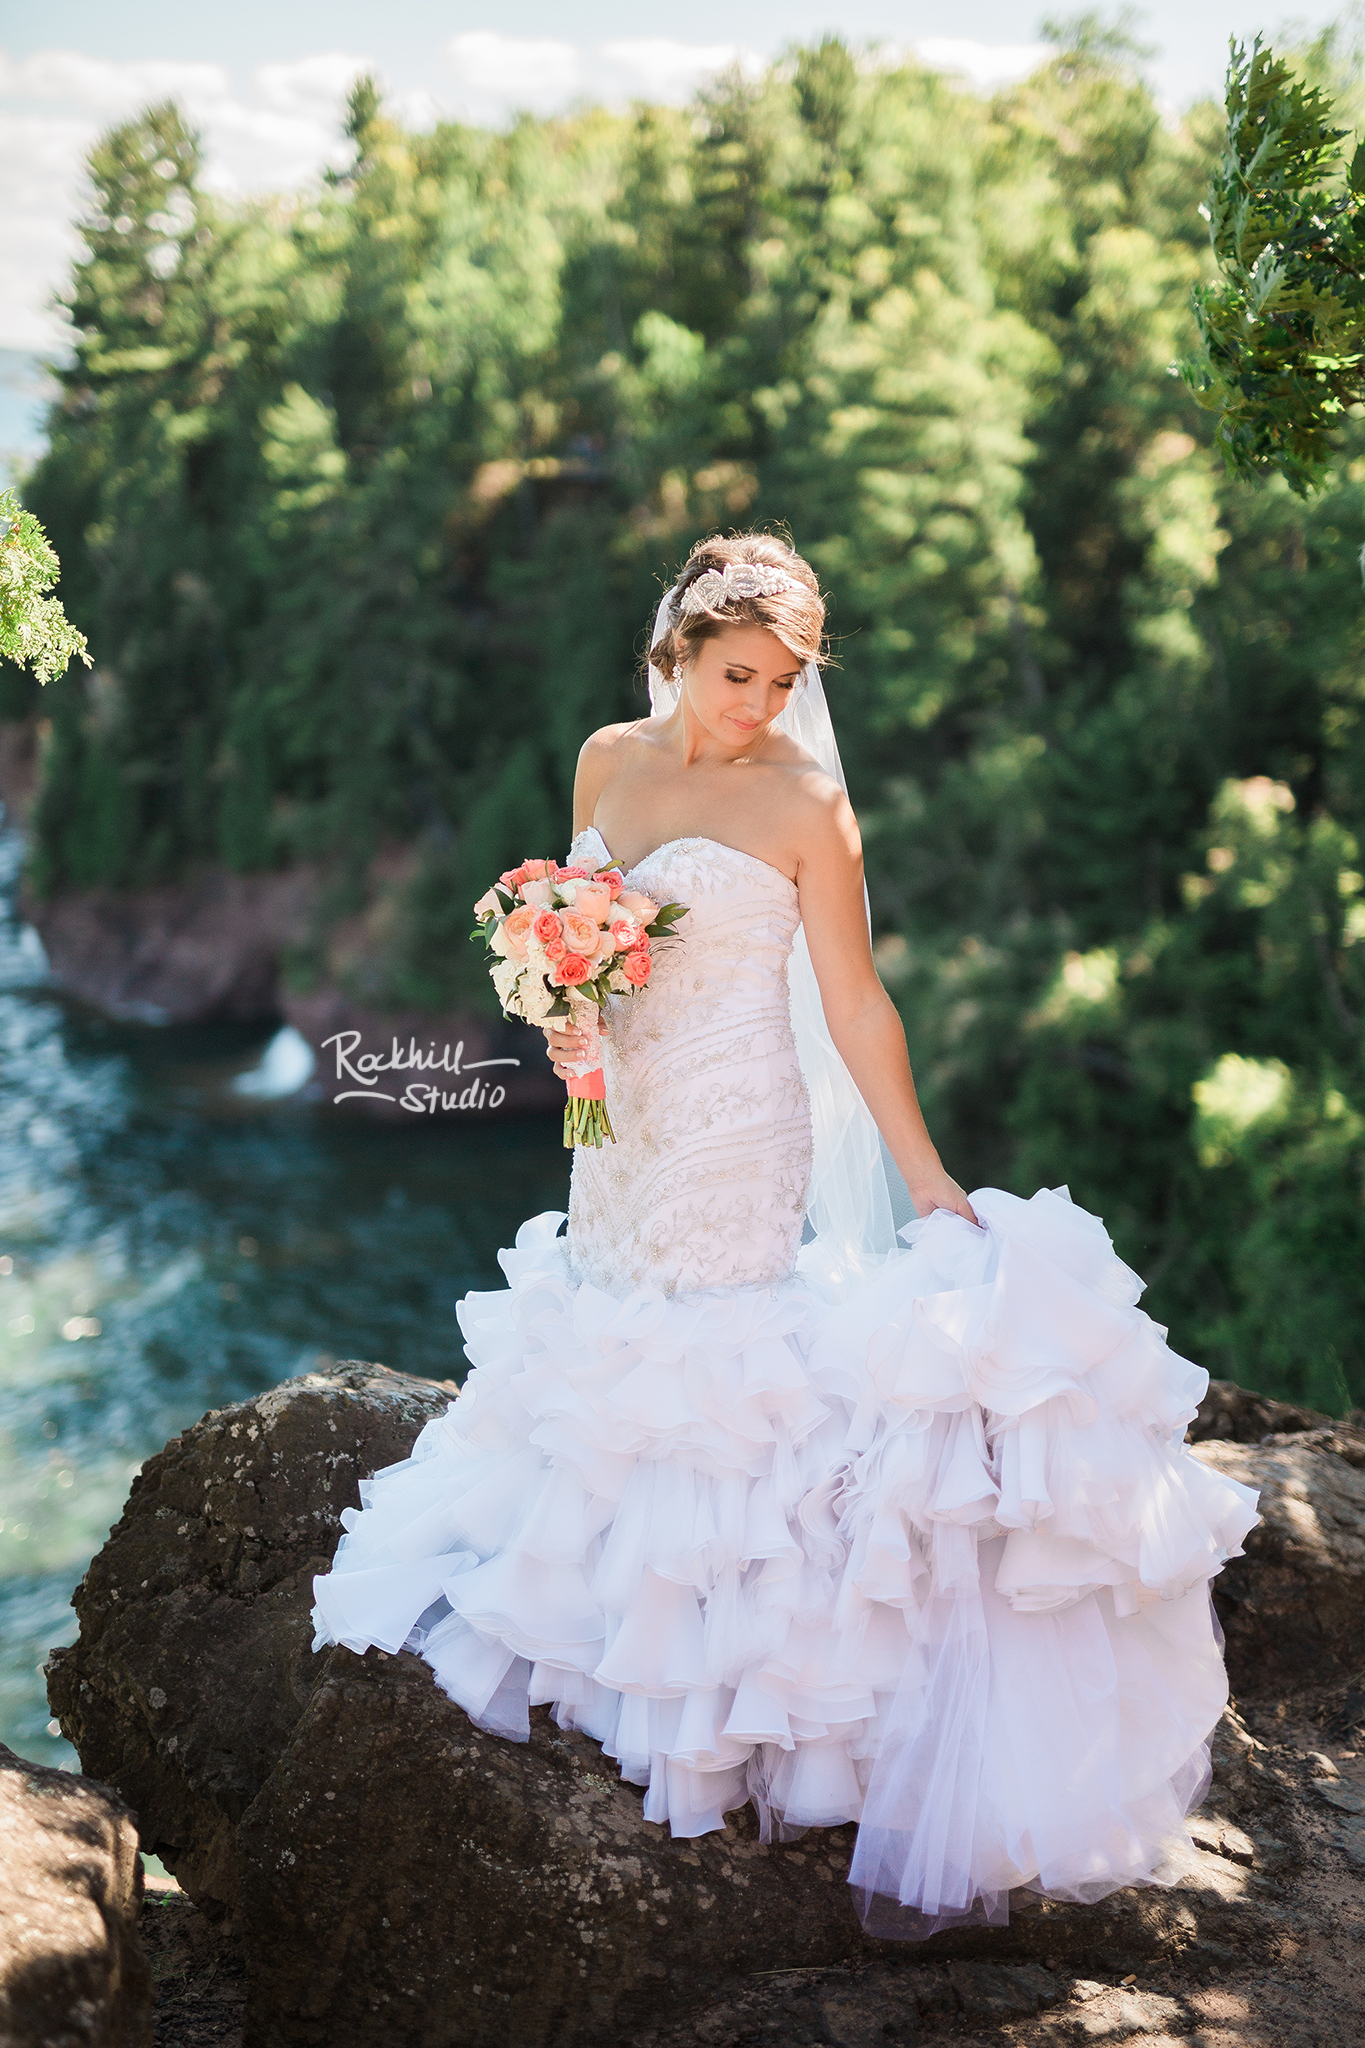 marquette-wedding-upper-peninsula-northern-michigan-wedding-ck-photography-wedding-party-22.jpg